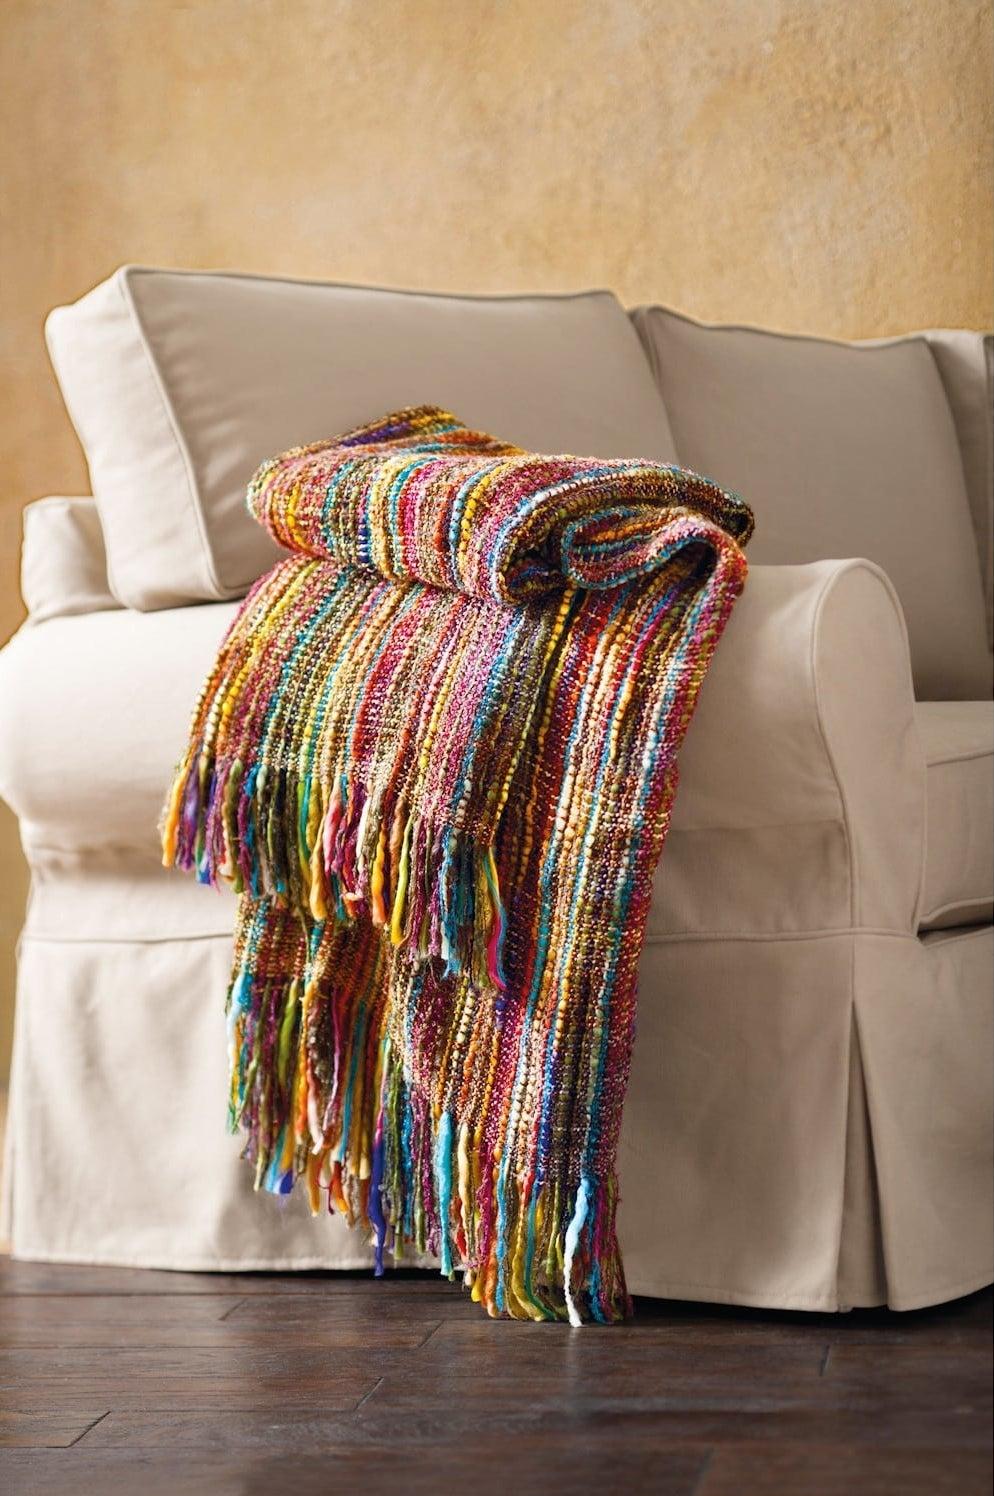 fringed rainbow throw on a couch